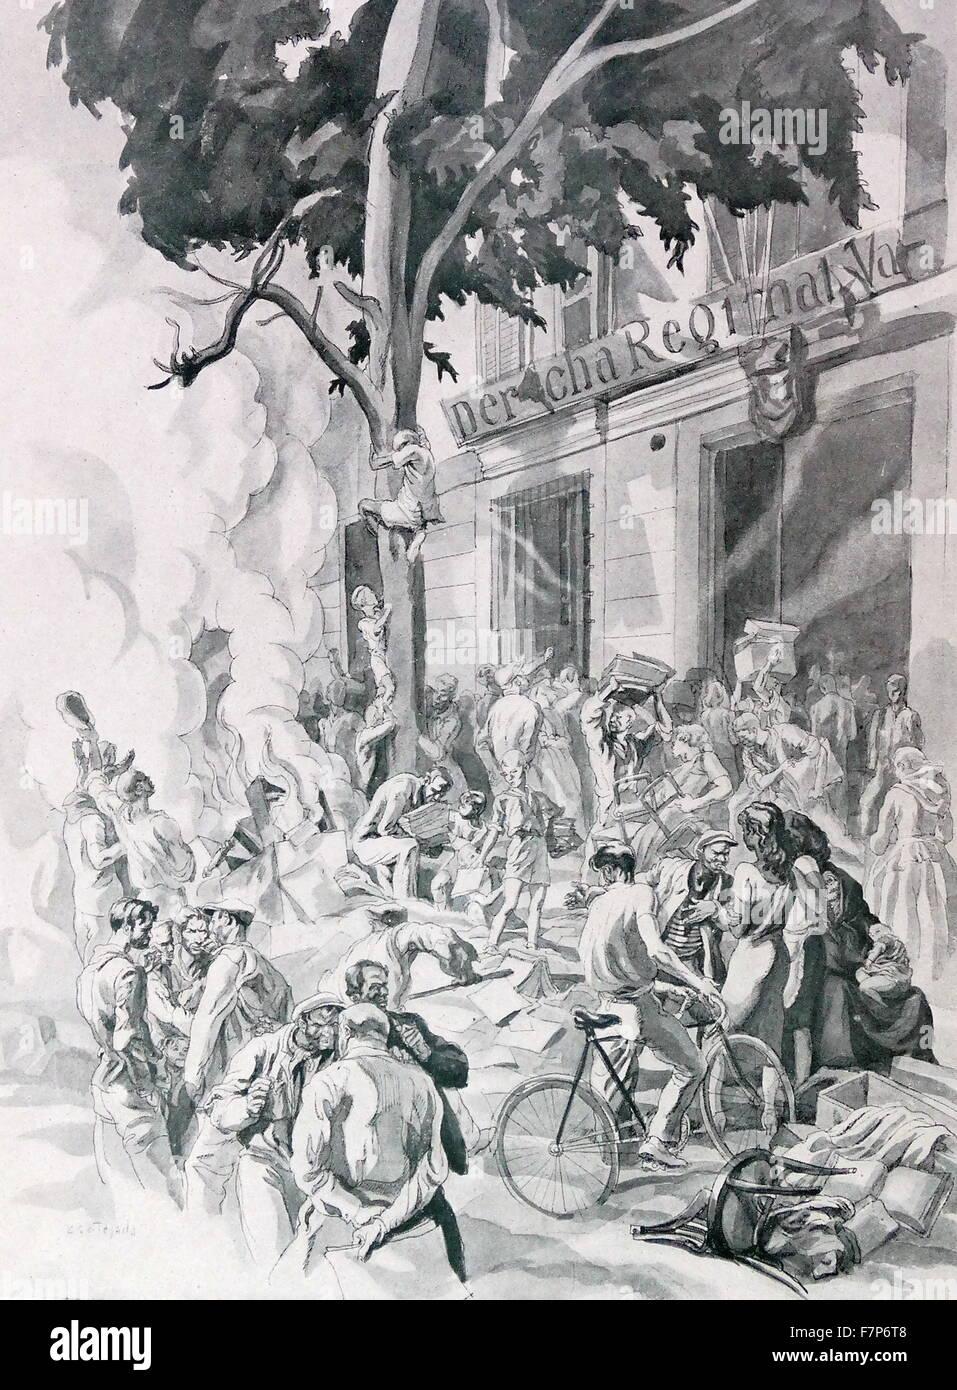 Anti-communist propaganda showing communists looting, during the Spanish Civil War;illustration 1937 - Stock Image